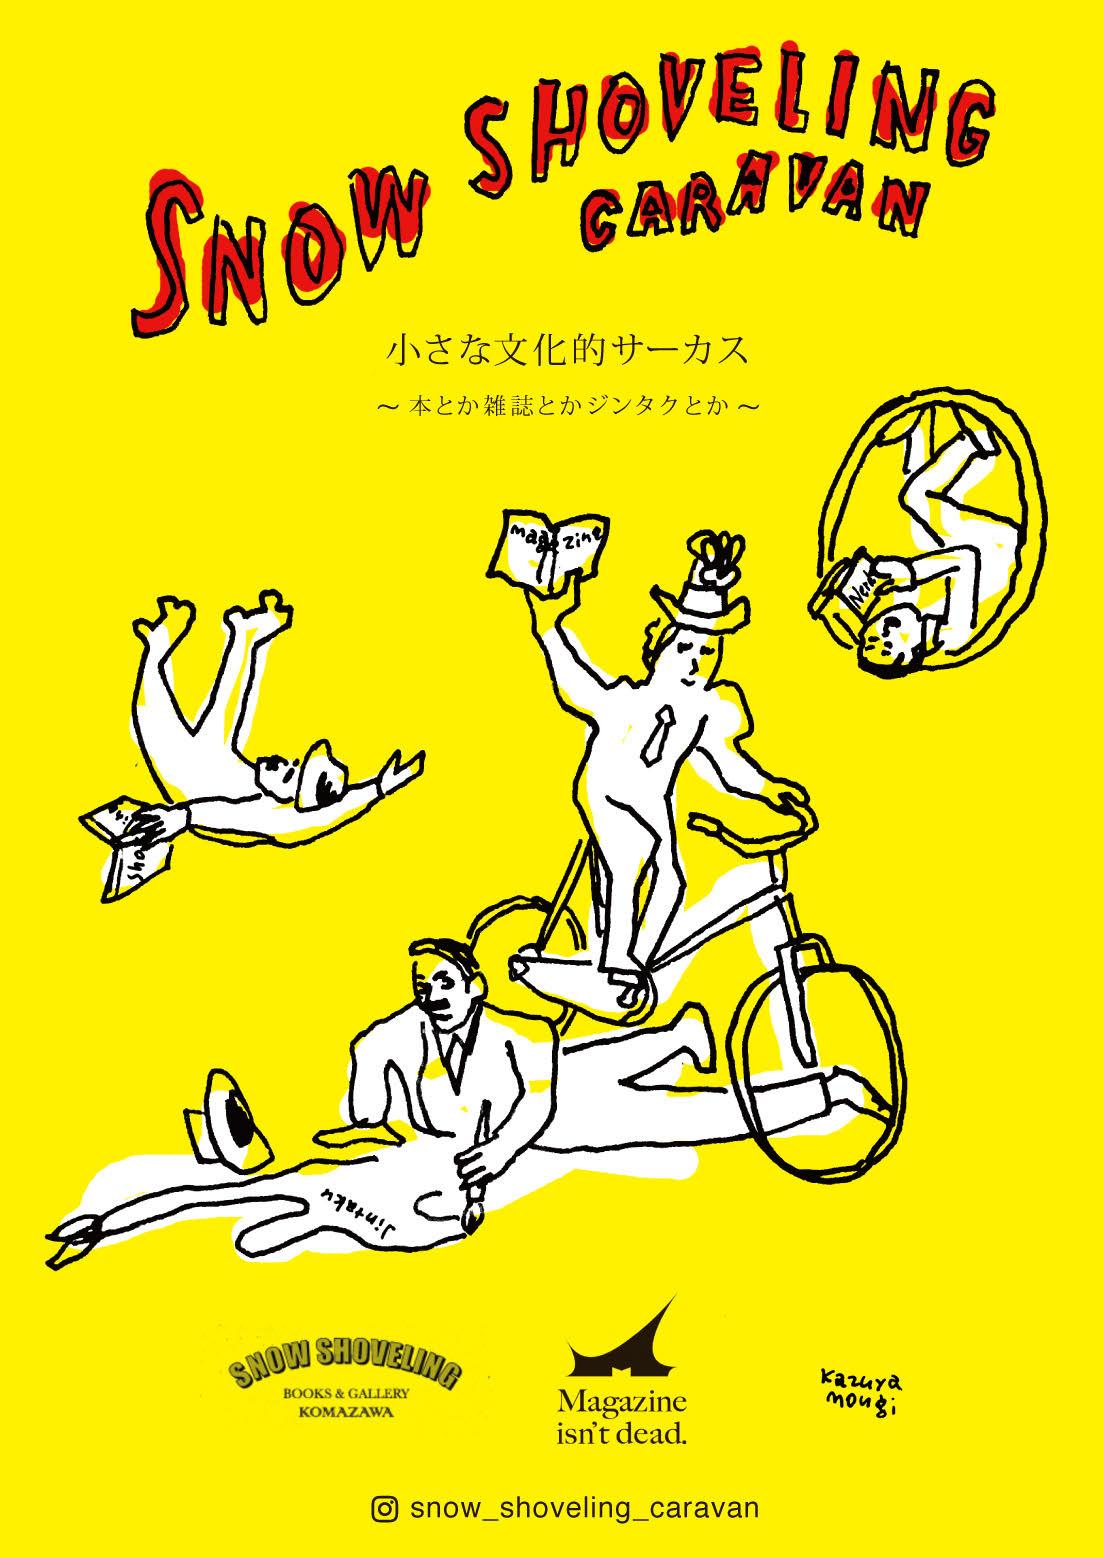 2020/3/9(Mon)〜3/22(Sun) snow shoveling caravan開催!